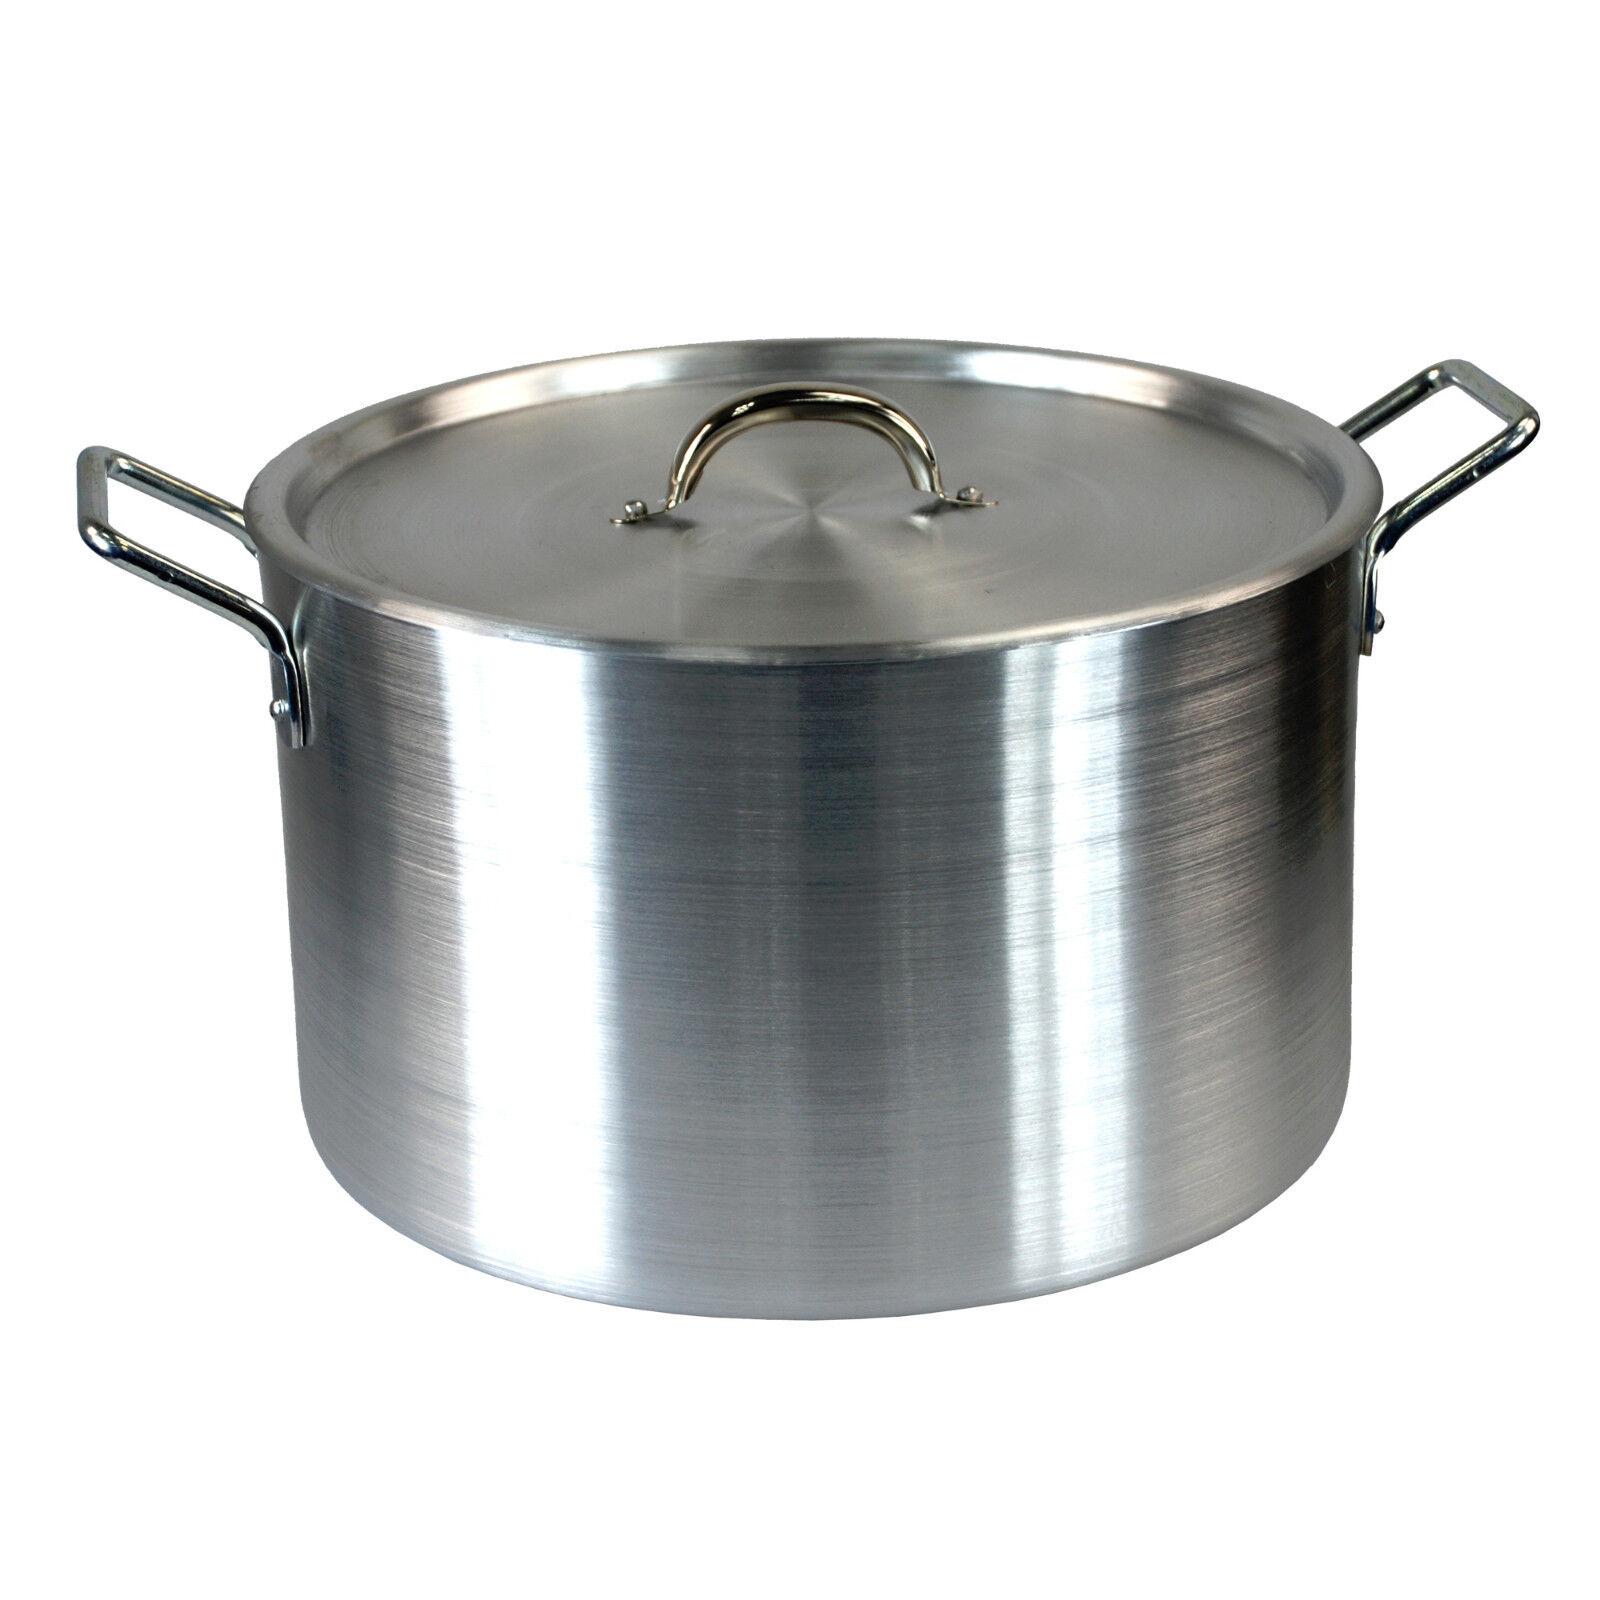 Super large 18  casserole Aluminium Cuisine Cuisson Pan Casserole Couvercle de Casserole valeur